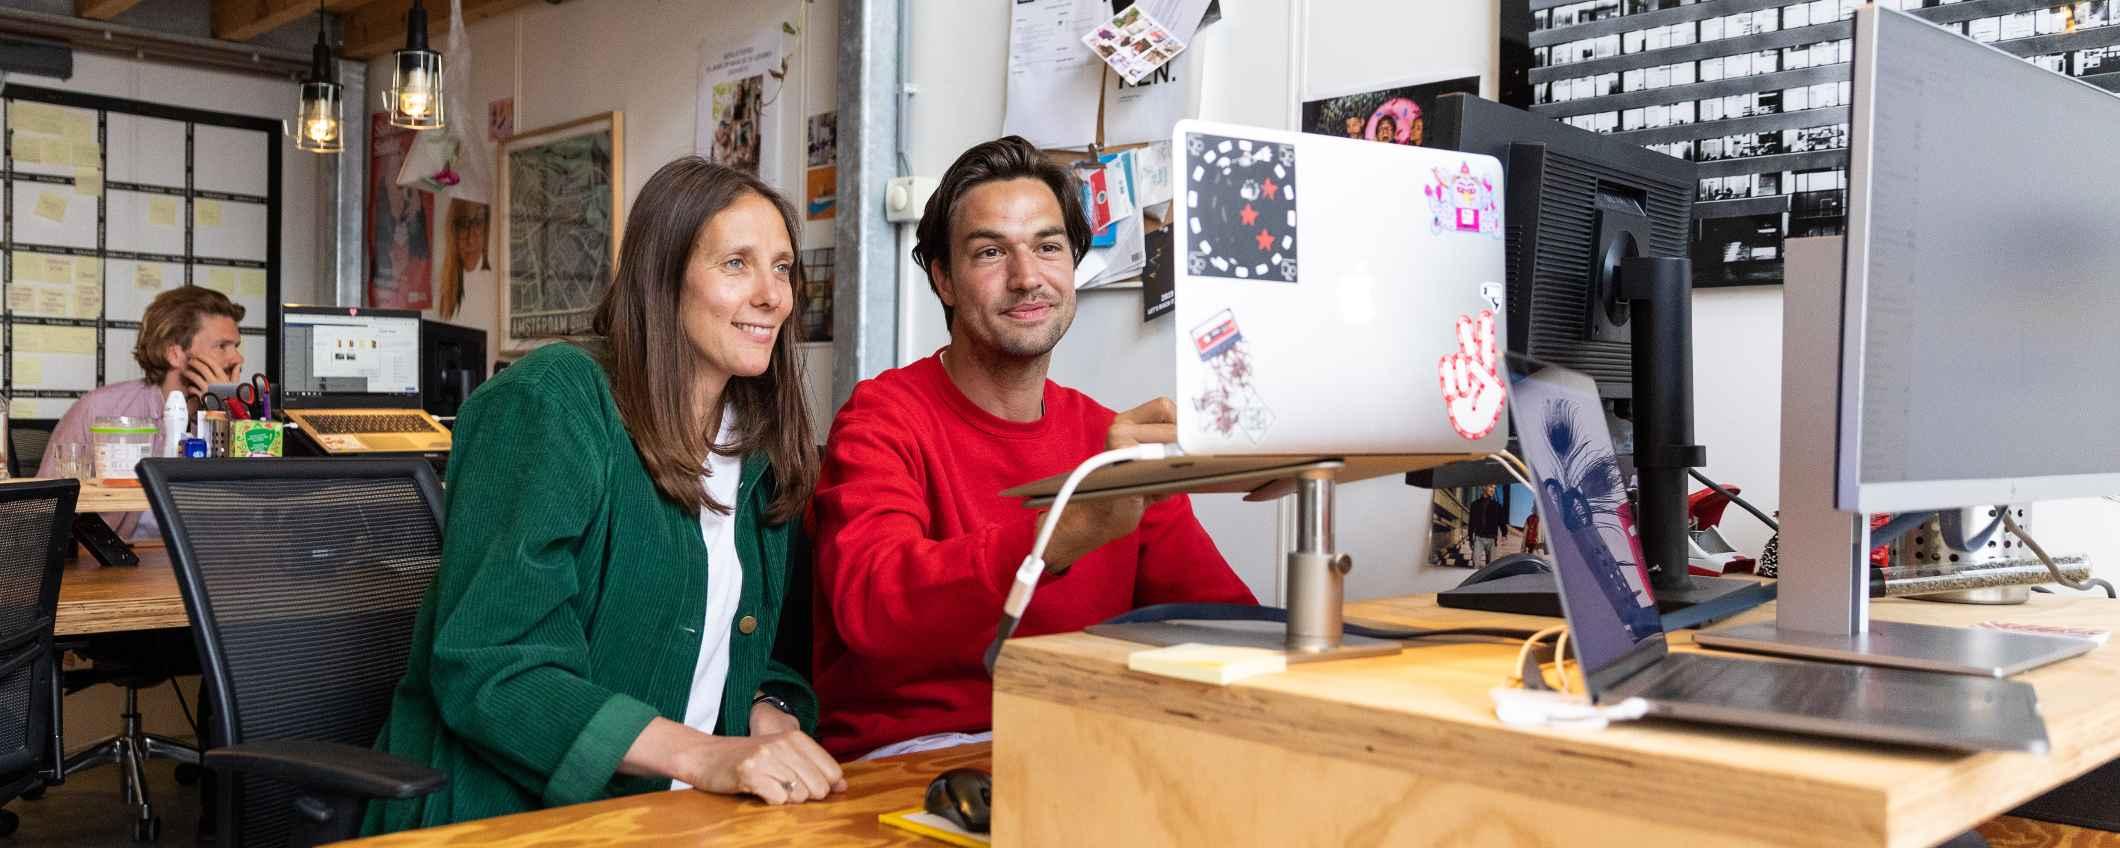 Twee medewerkers van het Volkshotel aan het werk achter laptop - Triodos Bank